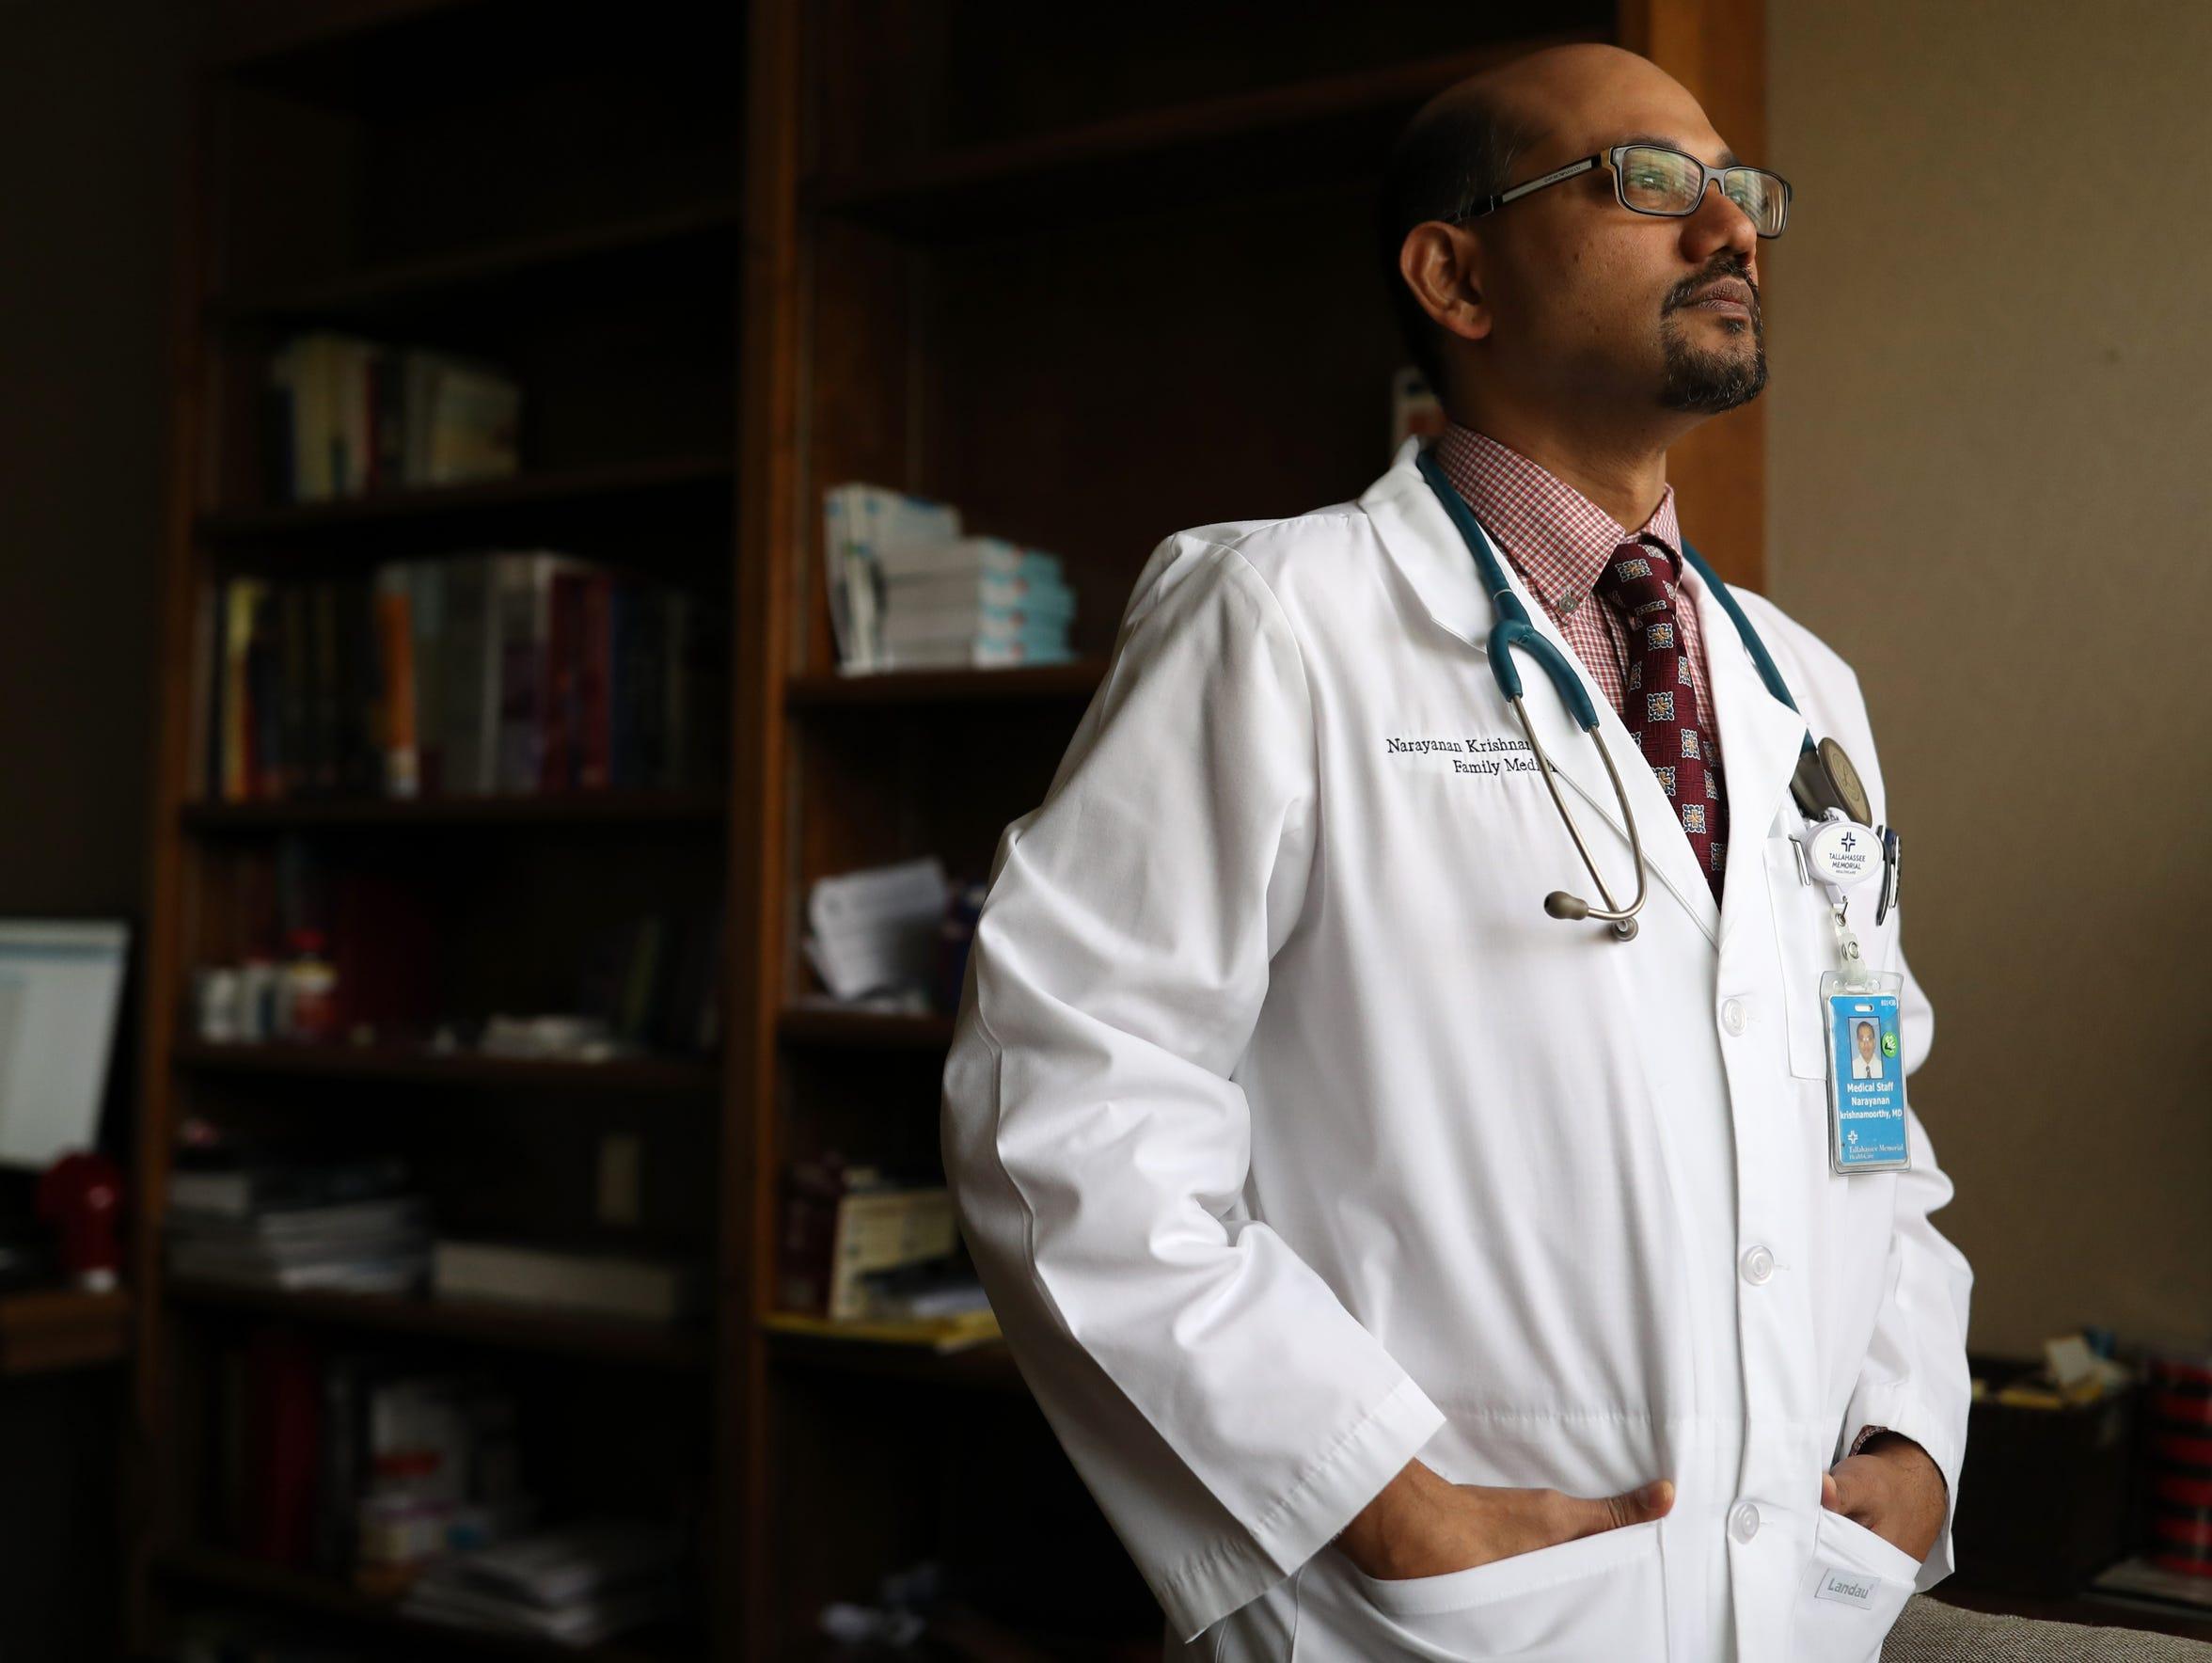 Dr. Narayanan Krishnamoorthy at his private practice